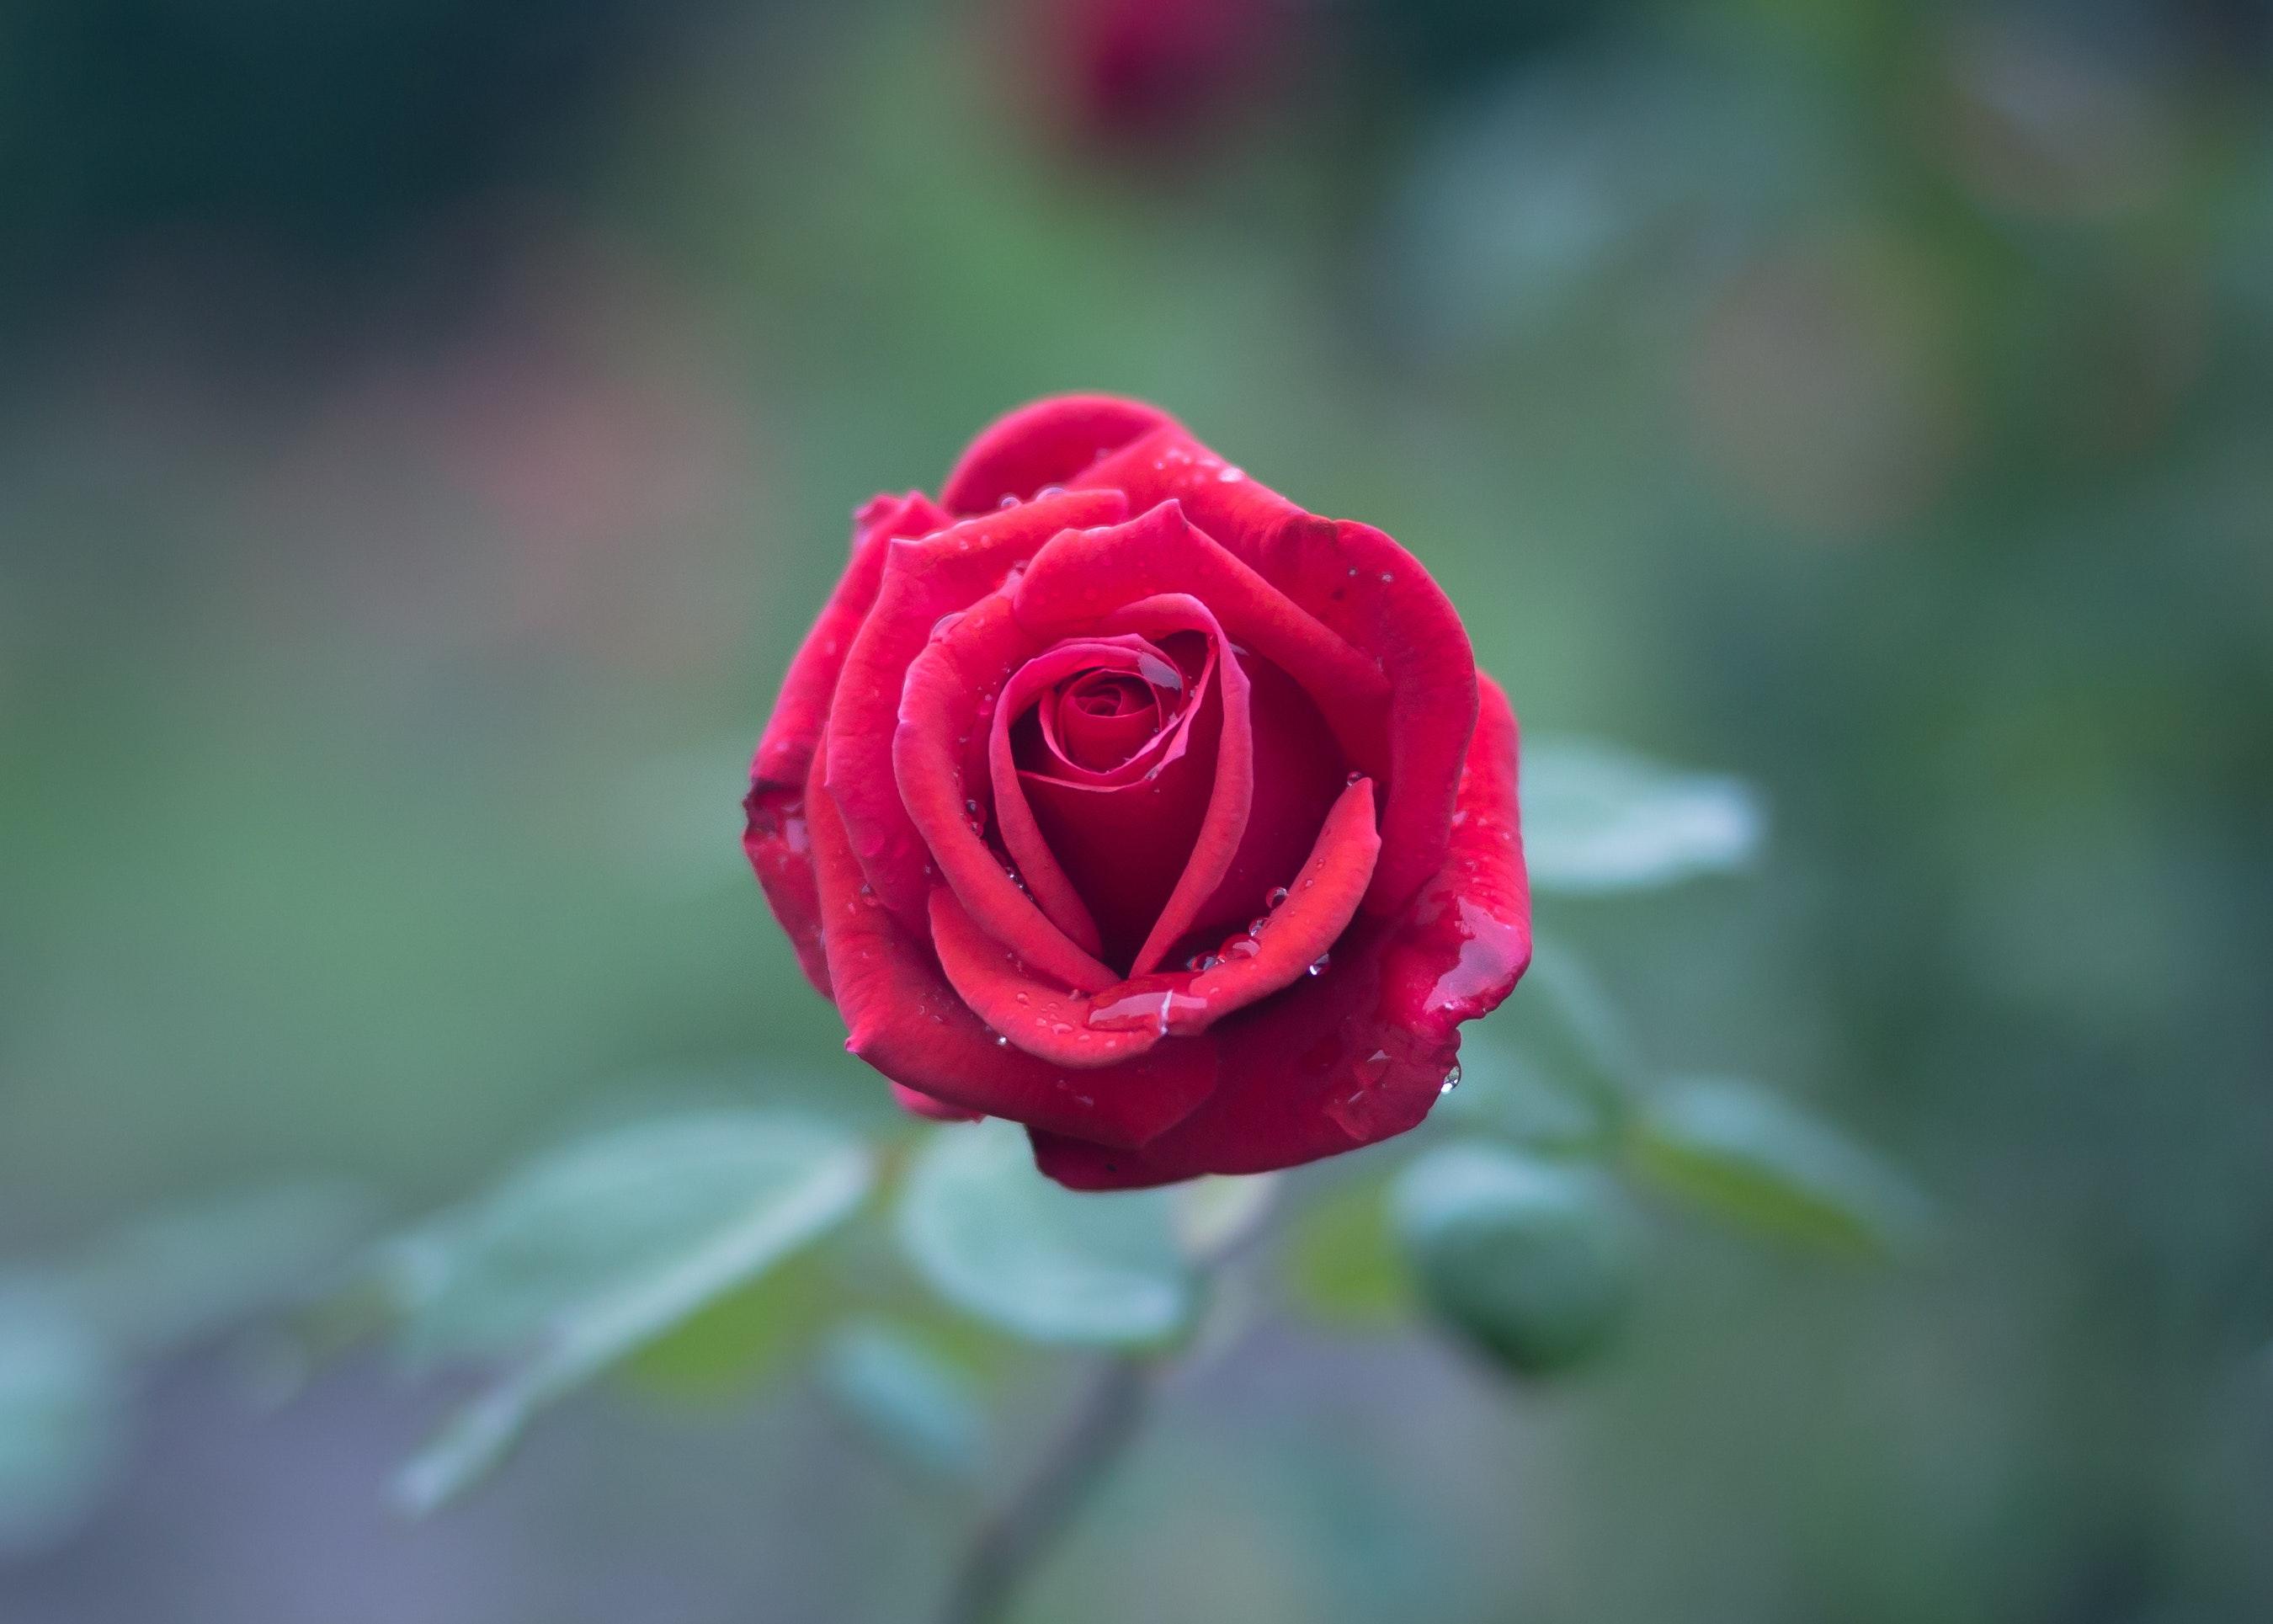 Red Rose, Macro, Rose, Petals, Flower, HQ Photo